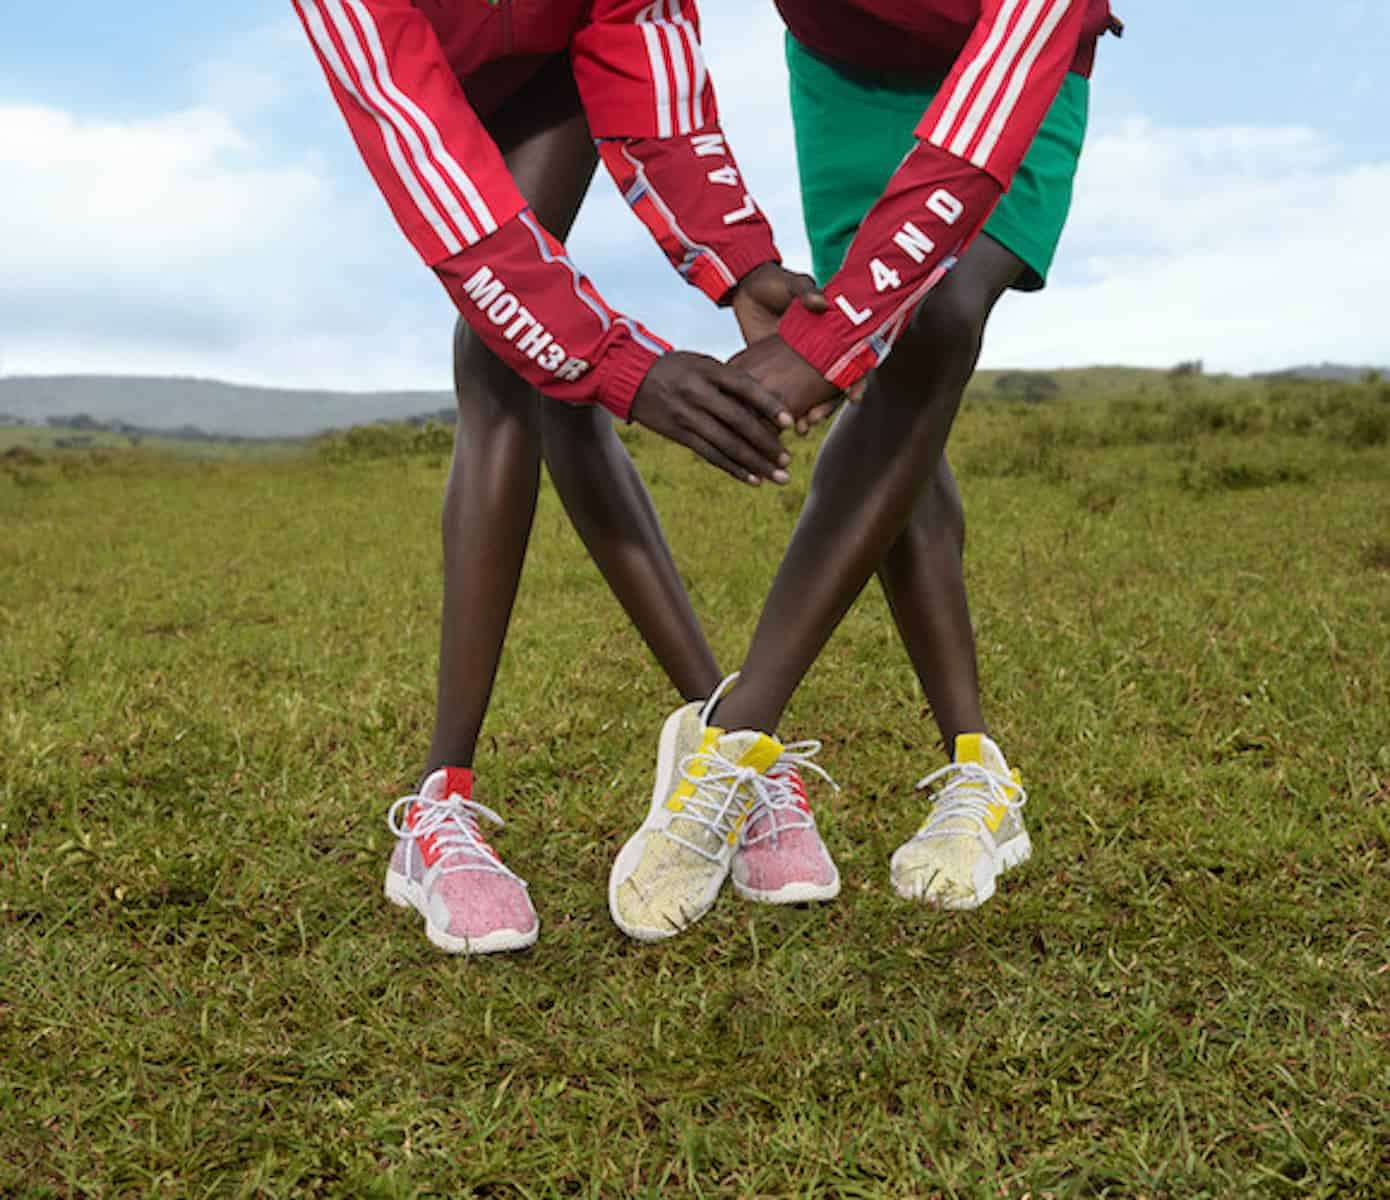 Adidas – Viviane Sassen – Kenya - Production by Baker & Co